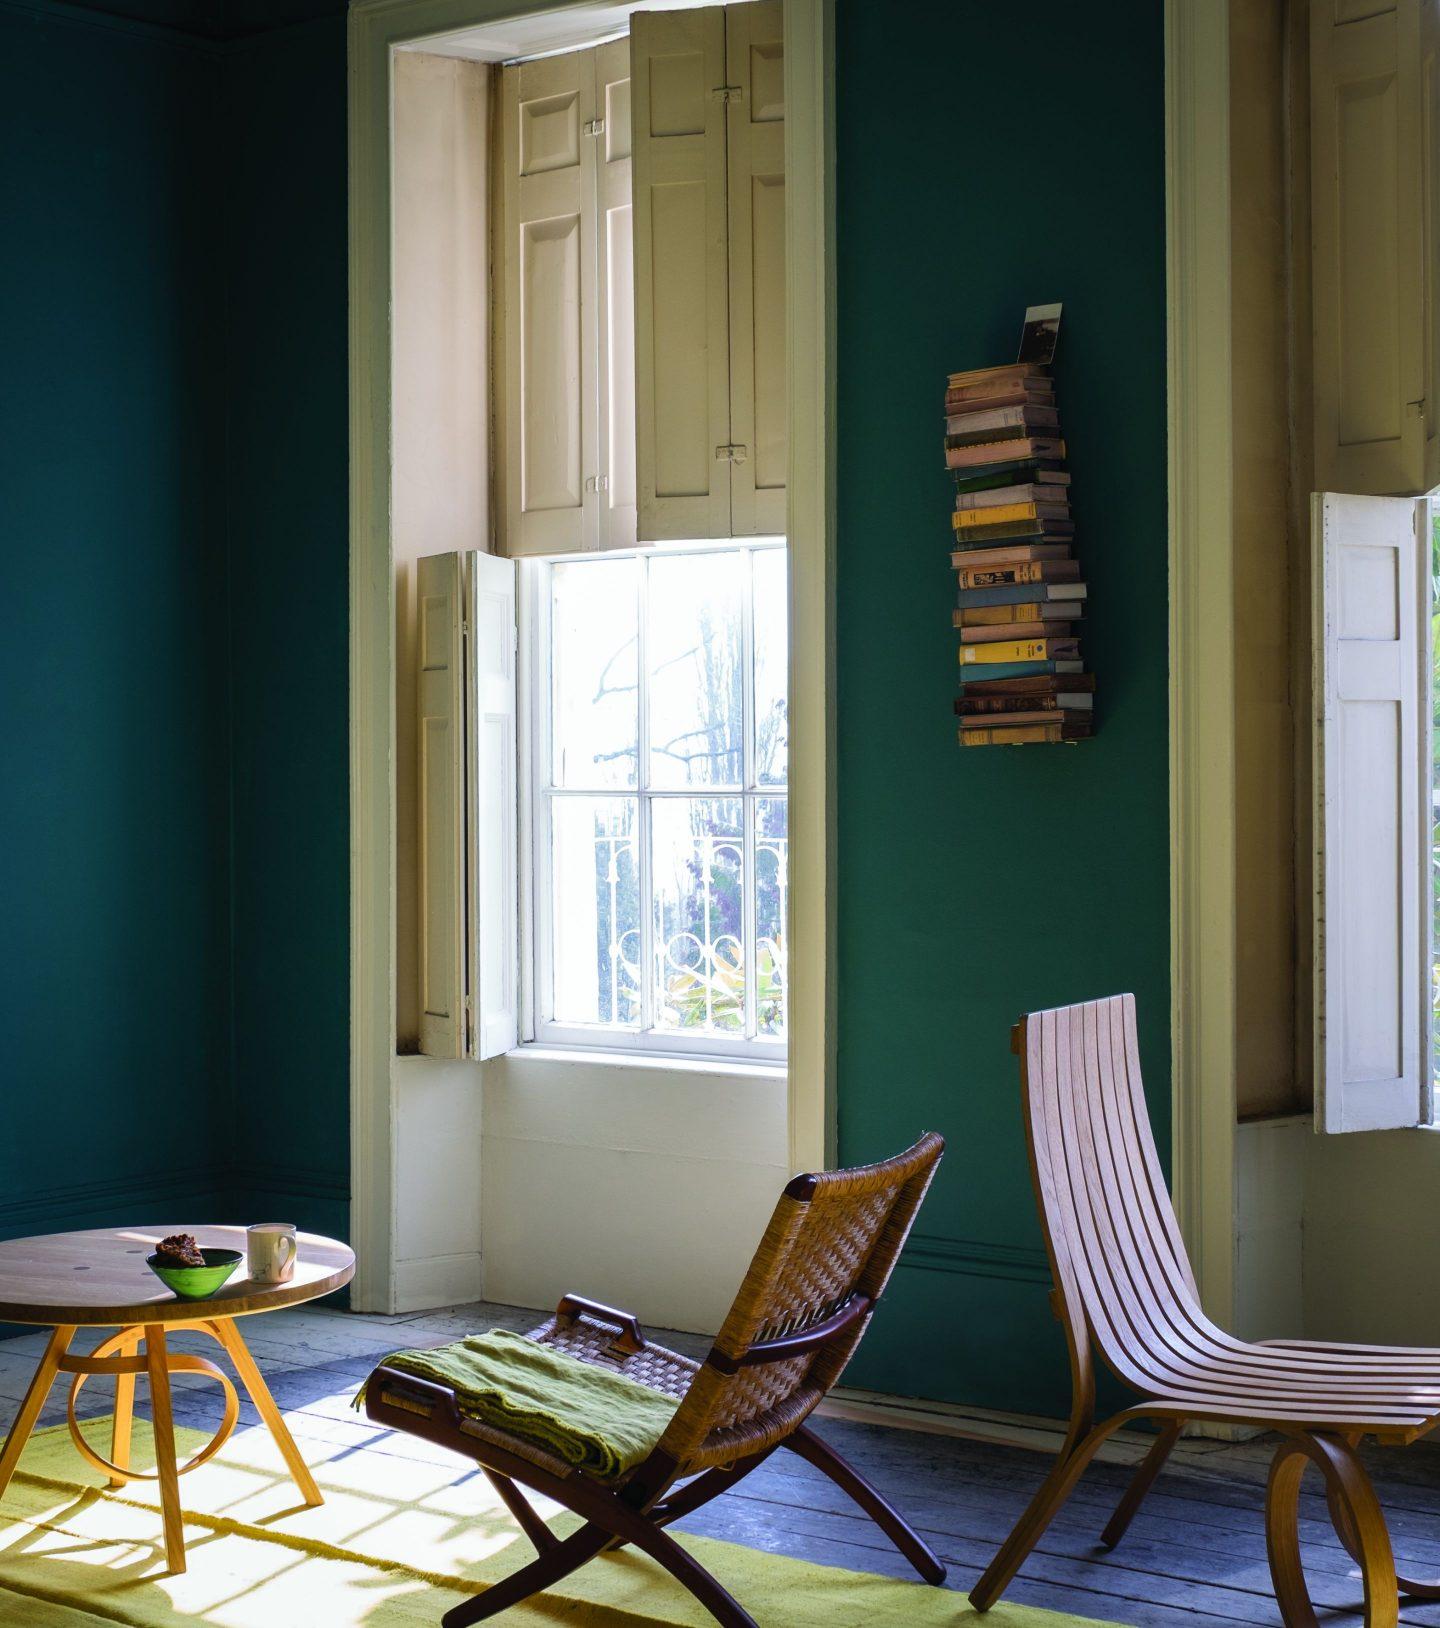 FarrowBall_1360427_VARDONo288.jpg-1440x1628 Paint Inspiration: 20 Colorful Rooms We Love